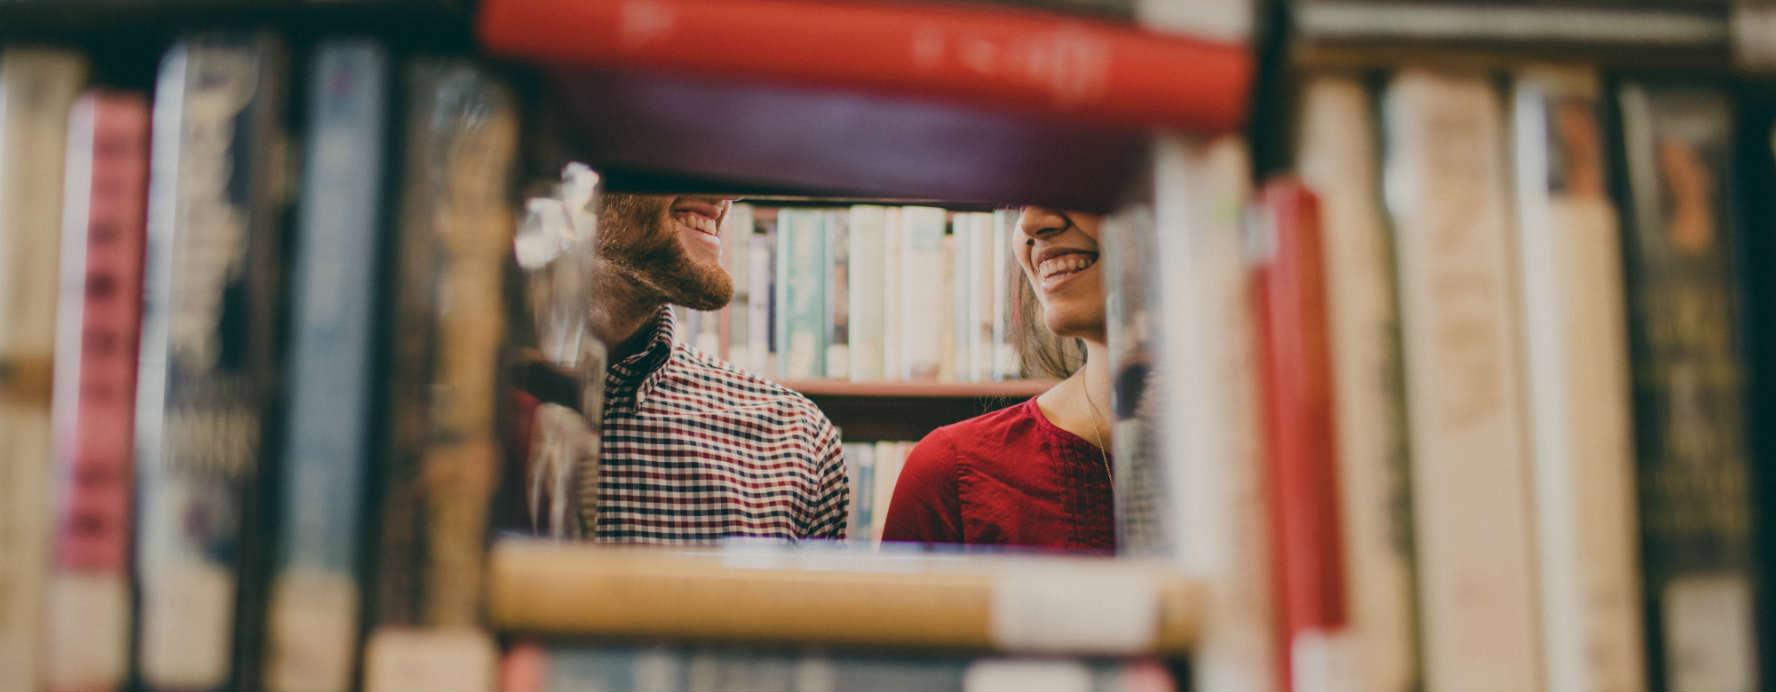 Rires en bibliothèque